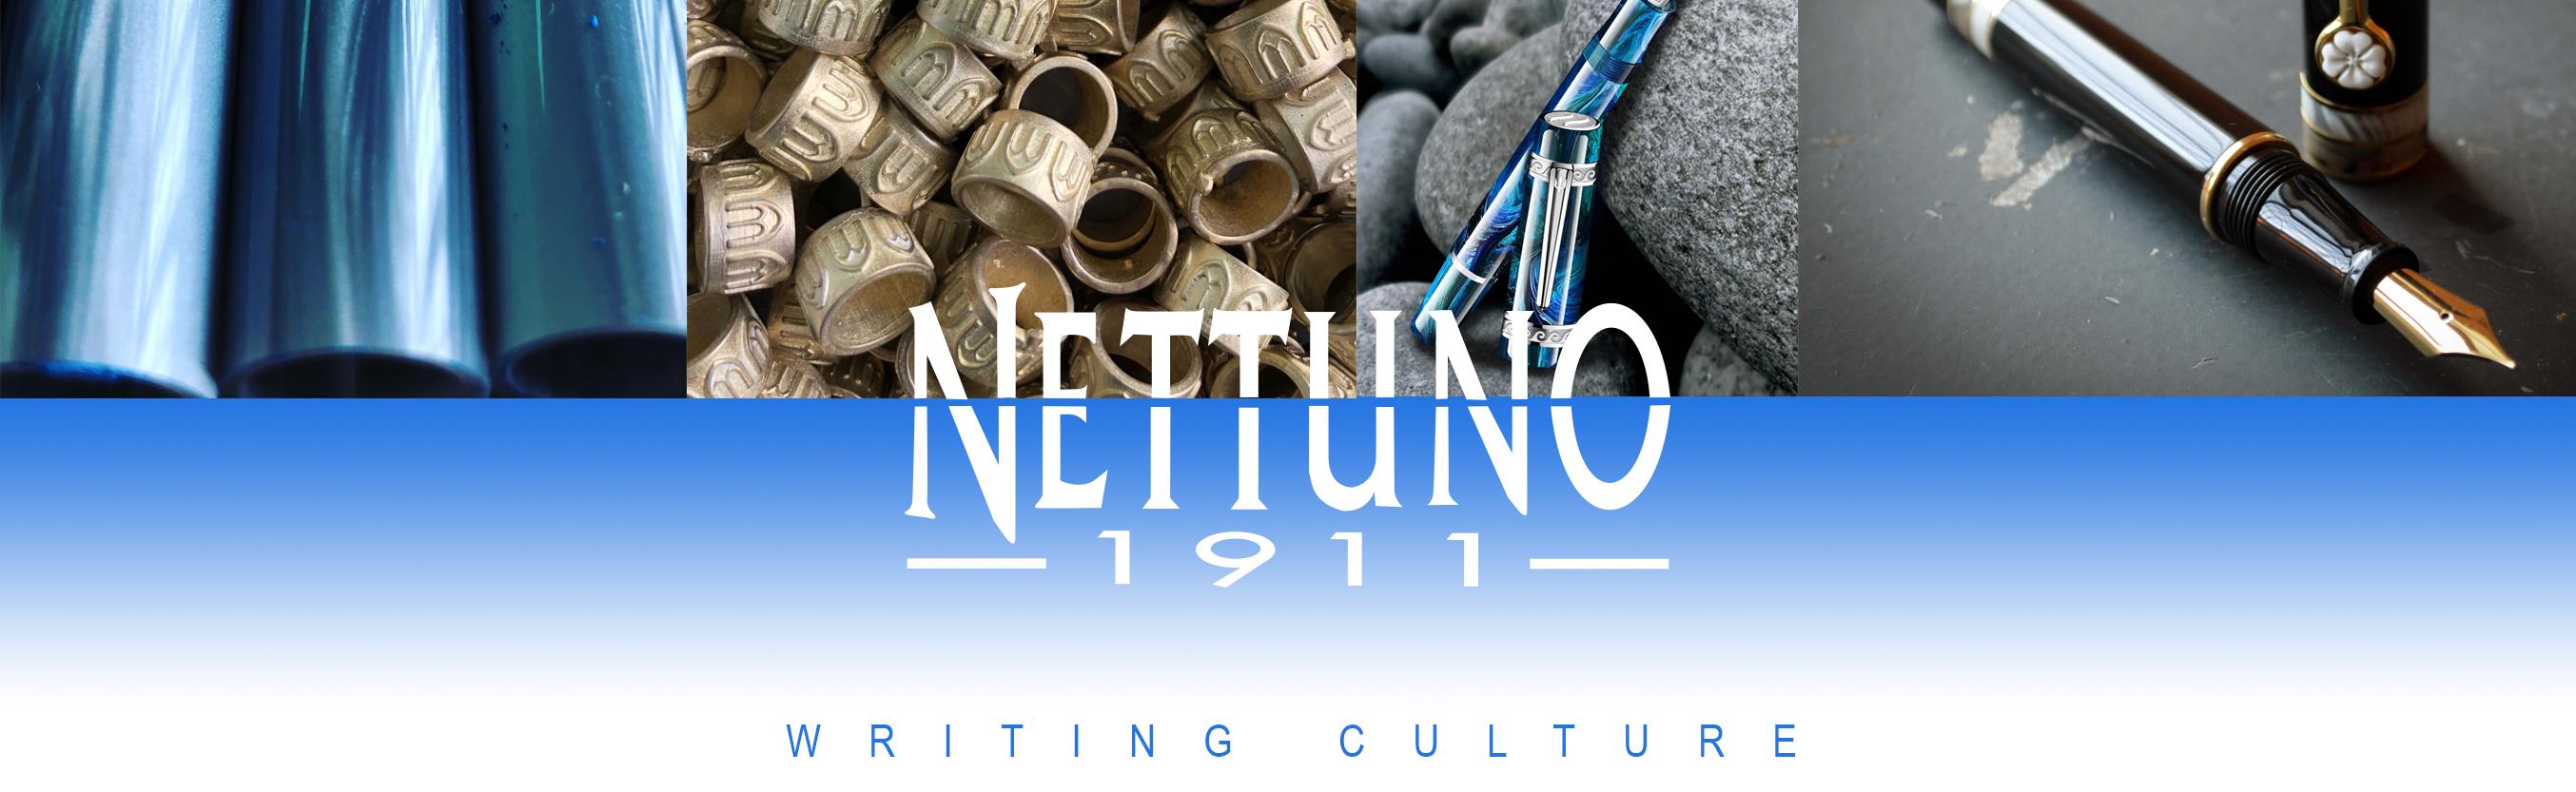 nettuno-banner-site-1.jpg